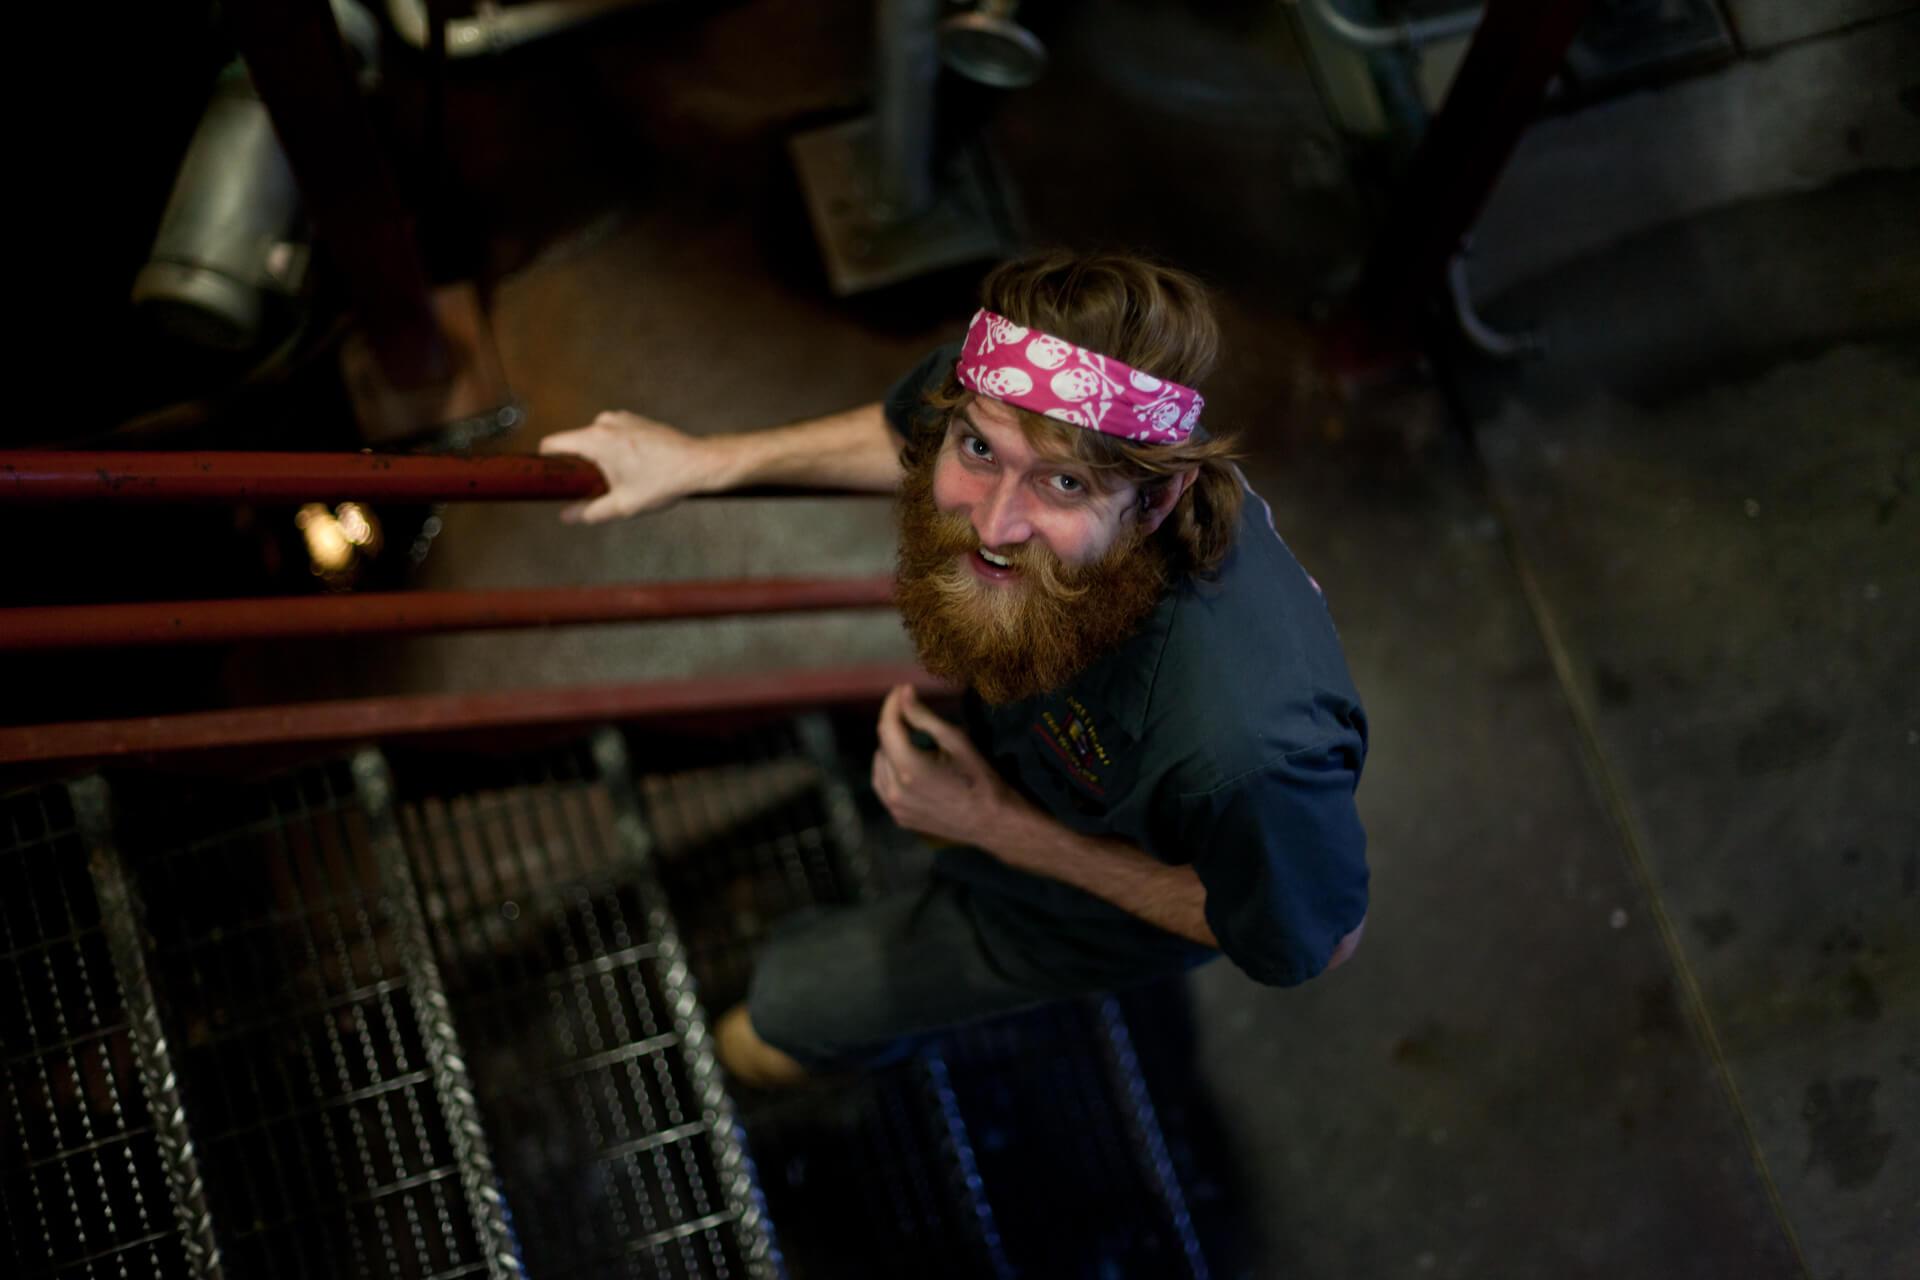 Evan Koepnick, Lakefront Brewery